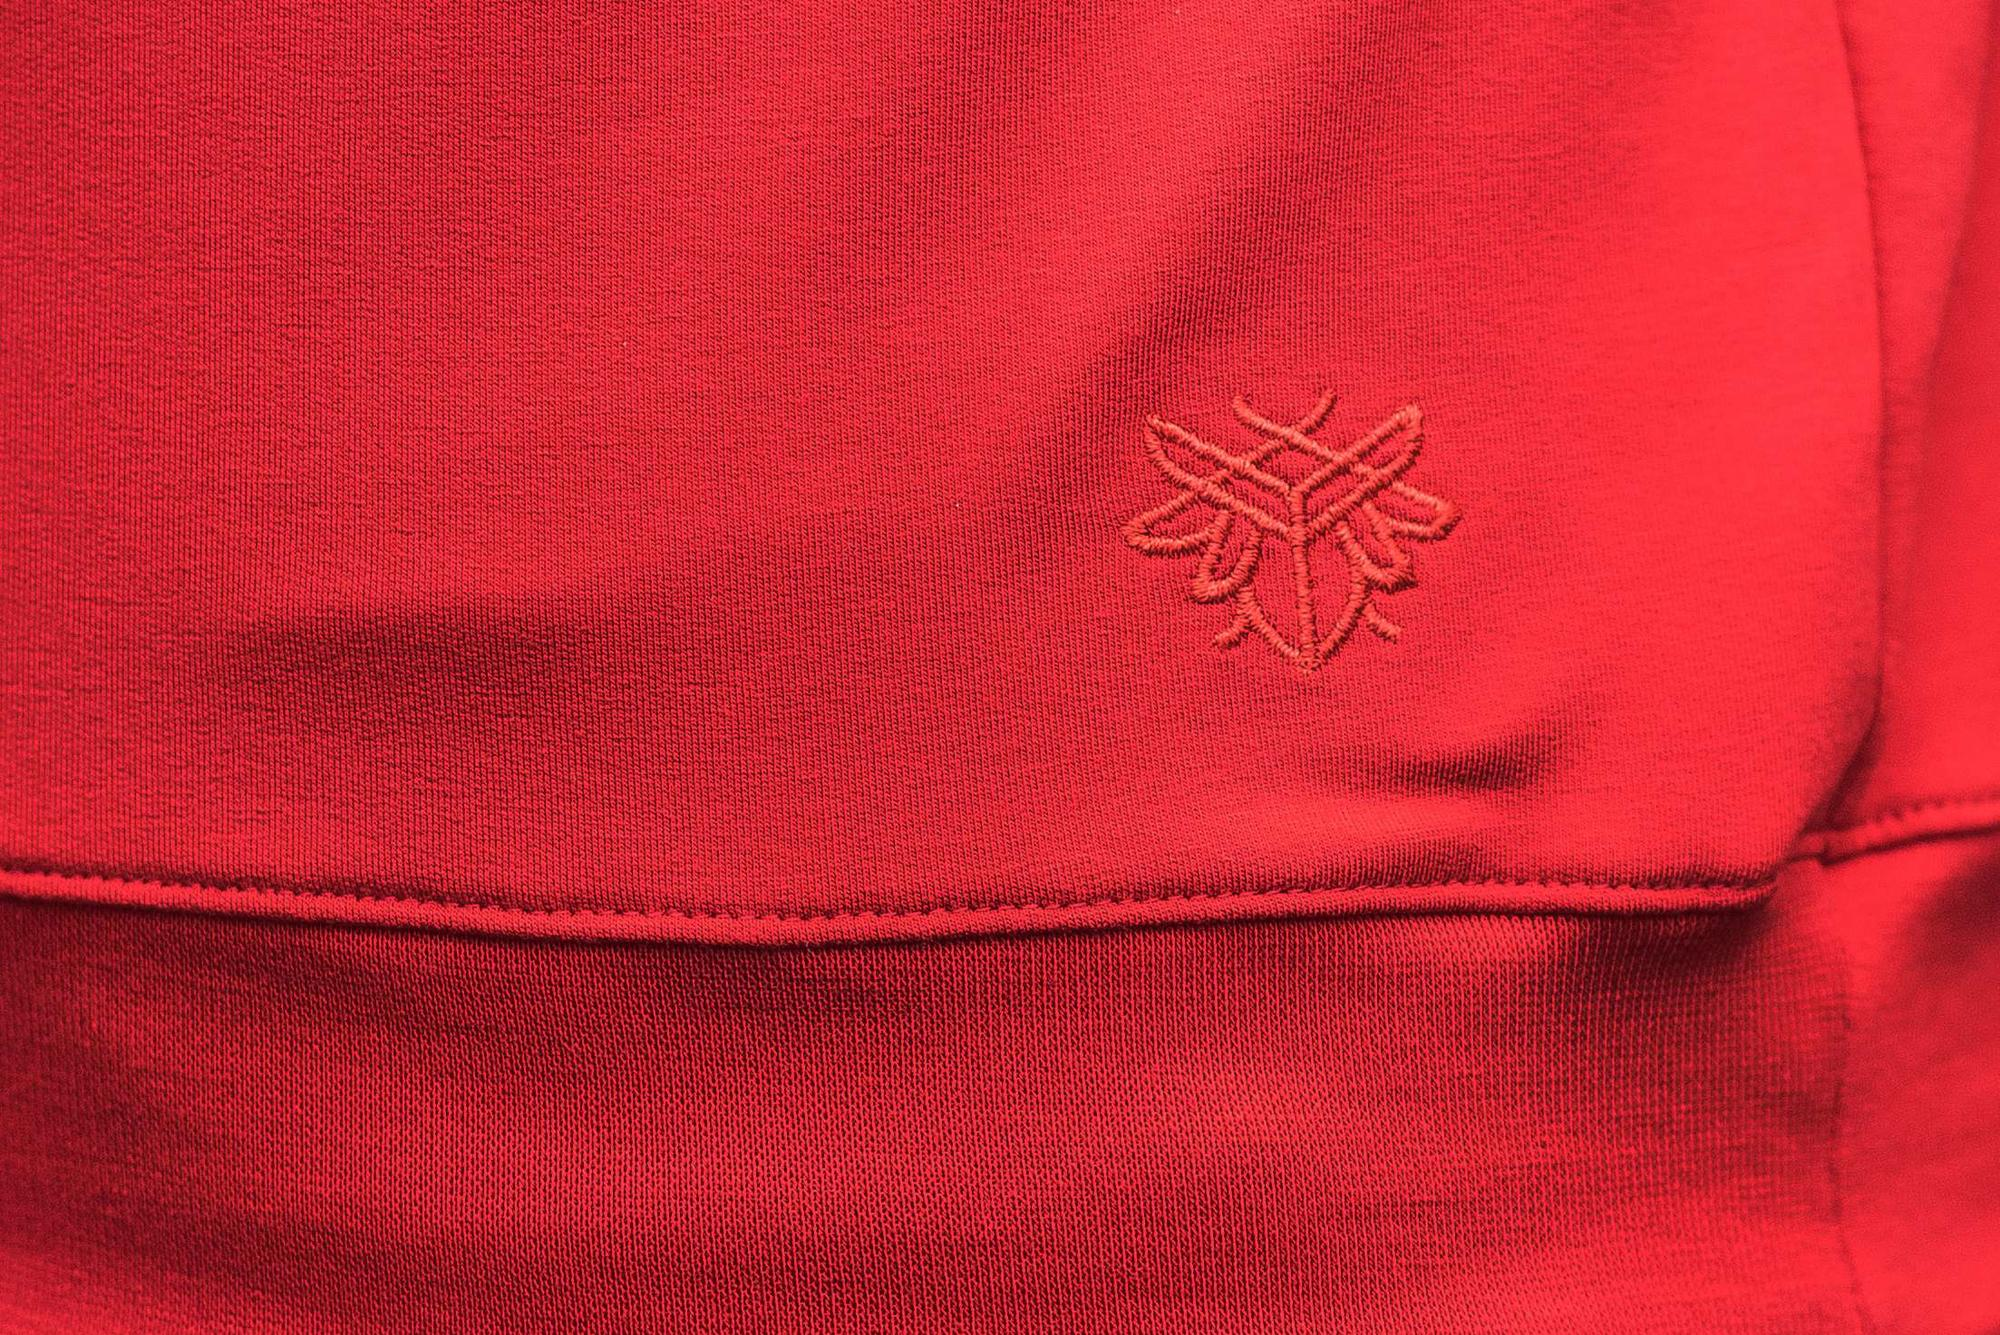 BAMBUSOWA BLUZA DAMSKA MAŁY SKARABEUSZ RED - Lucky Thing